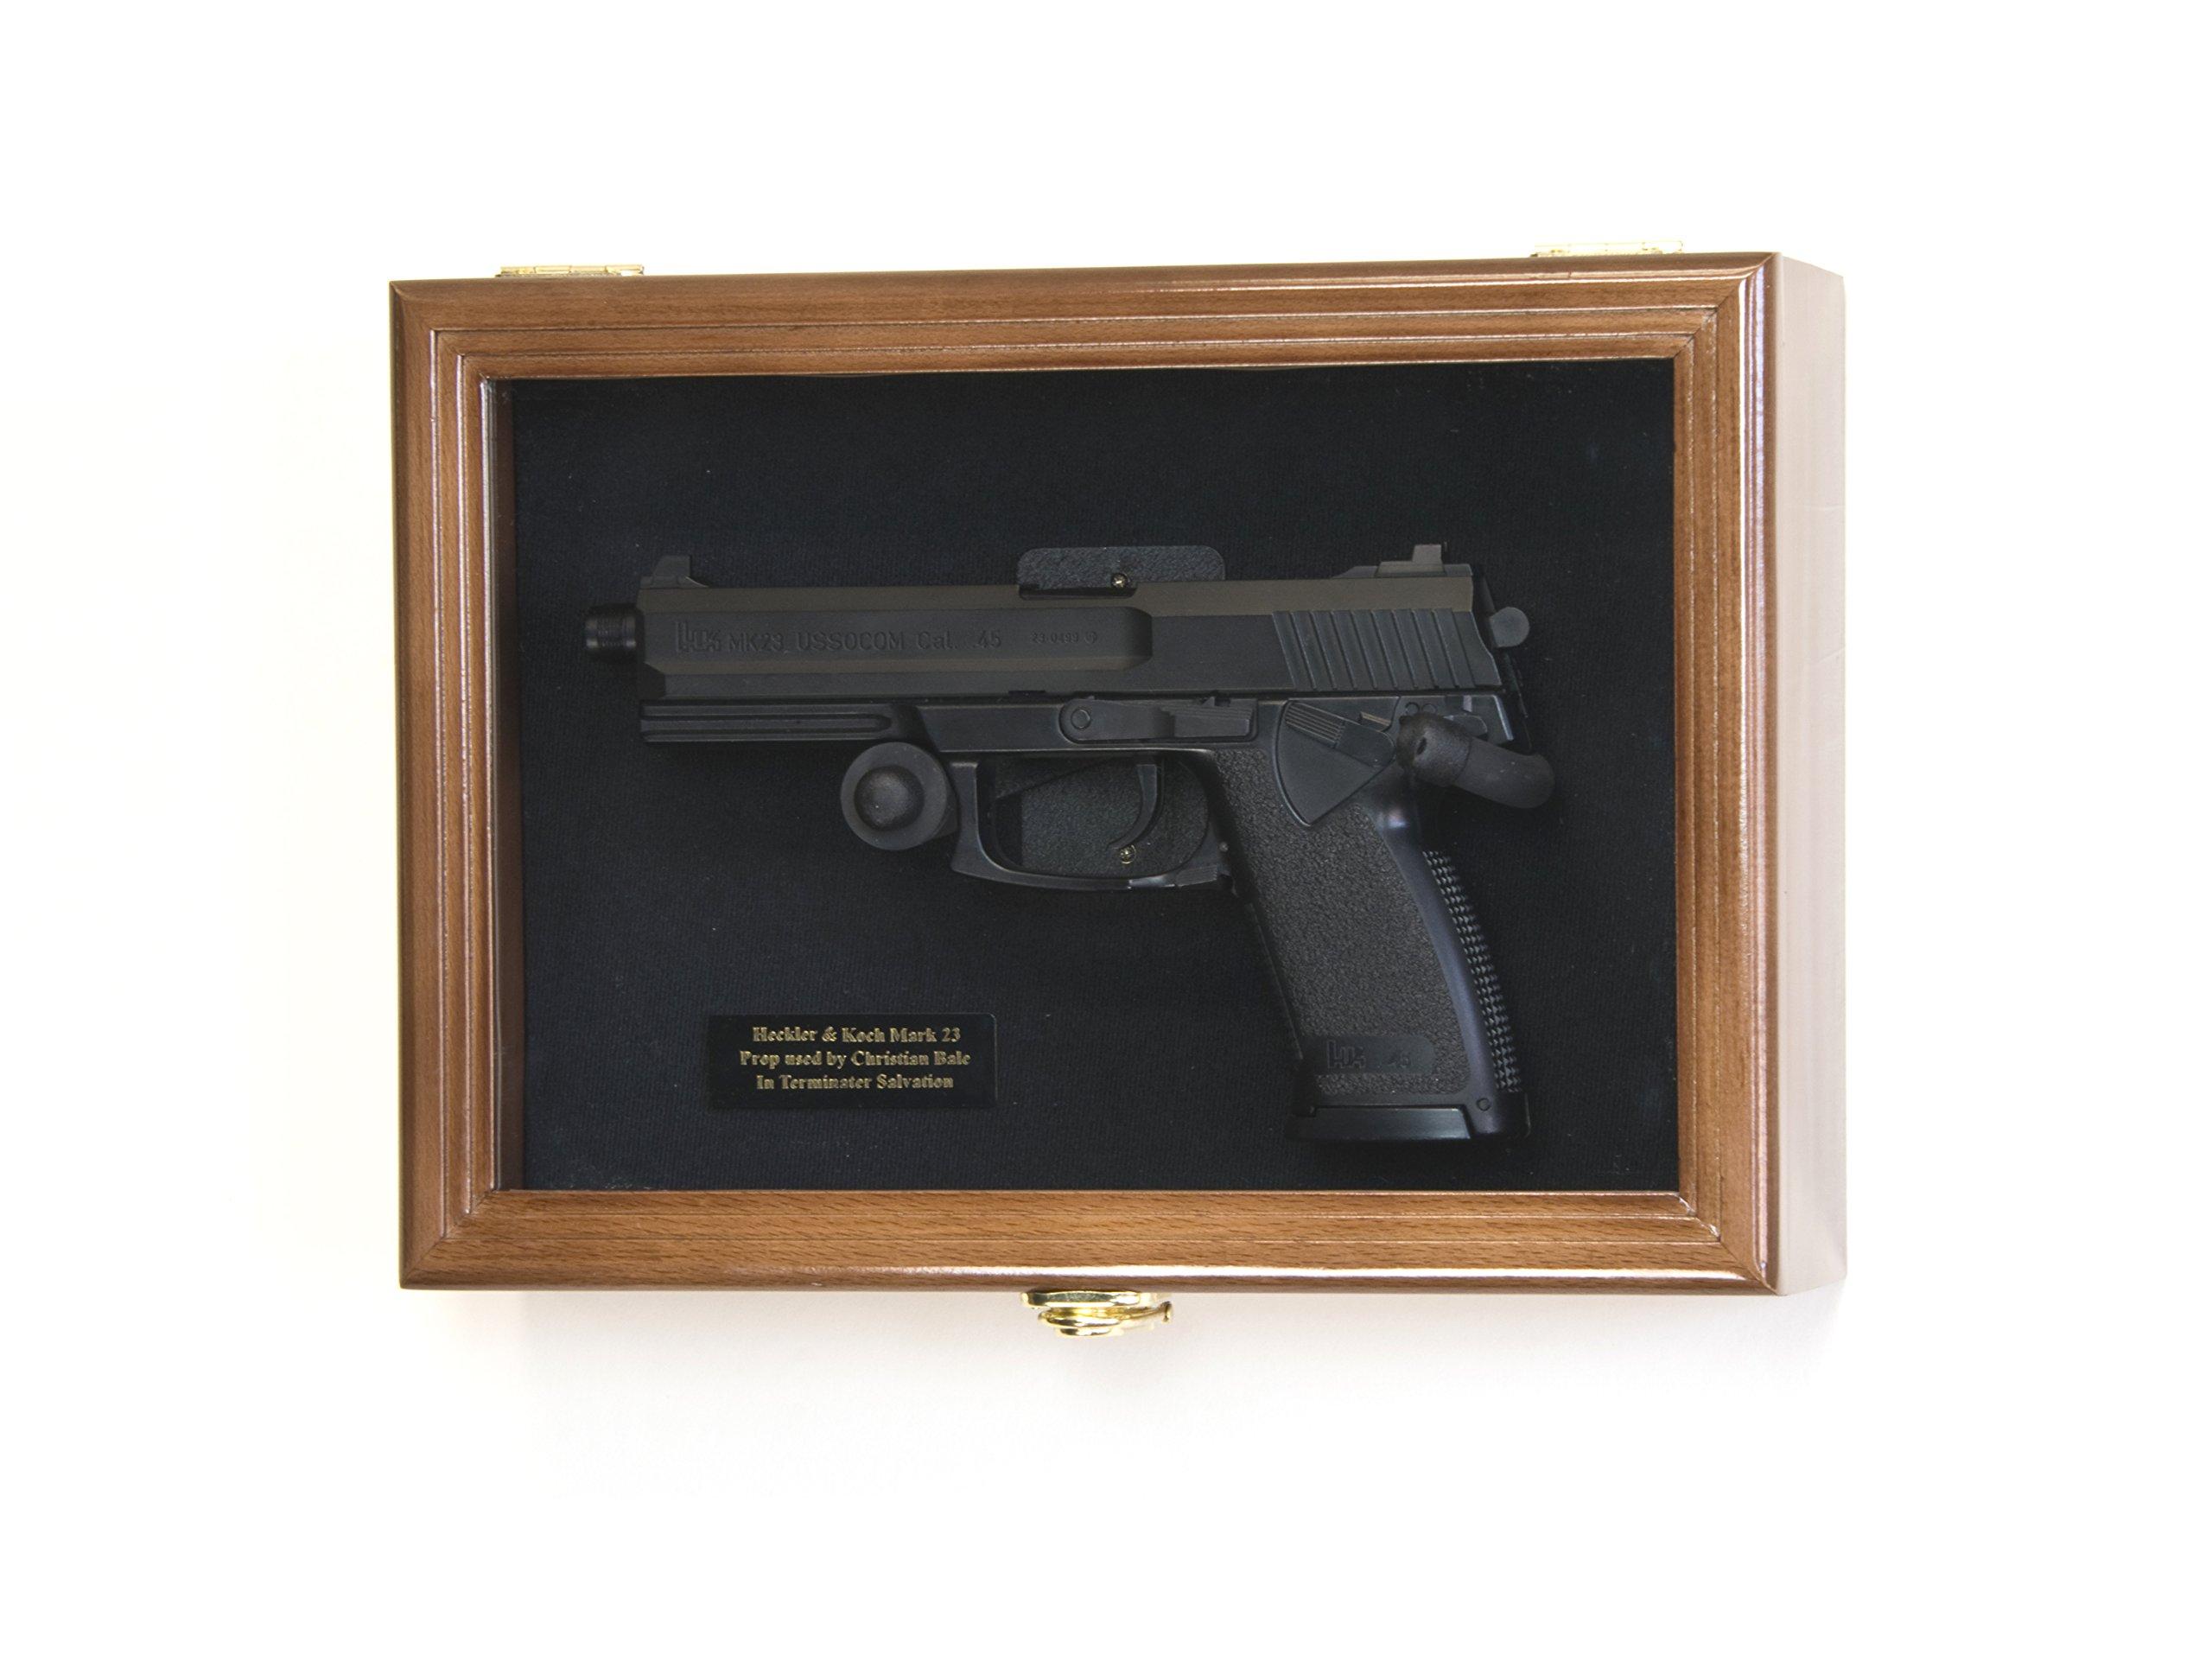 Single Pistol Display Case Wall Mount Solid Hardwood Cabinet (Walnut Finish, Black Felt Background) by sfDisplay.com, Factory Direct Display Cases